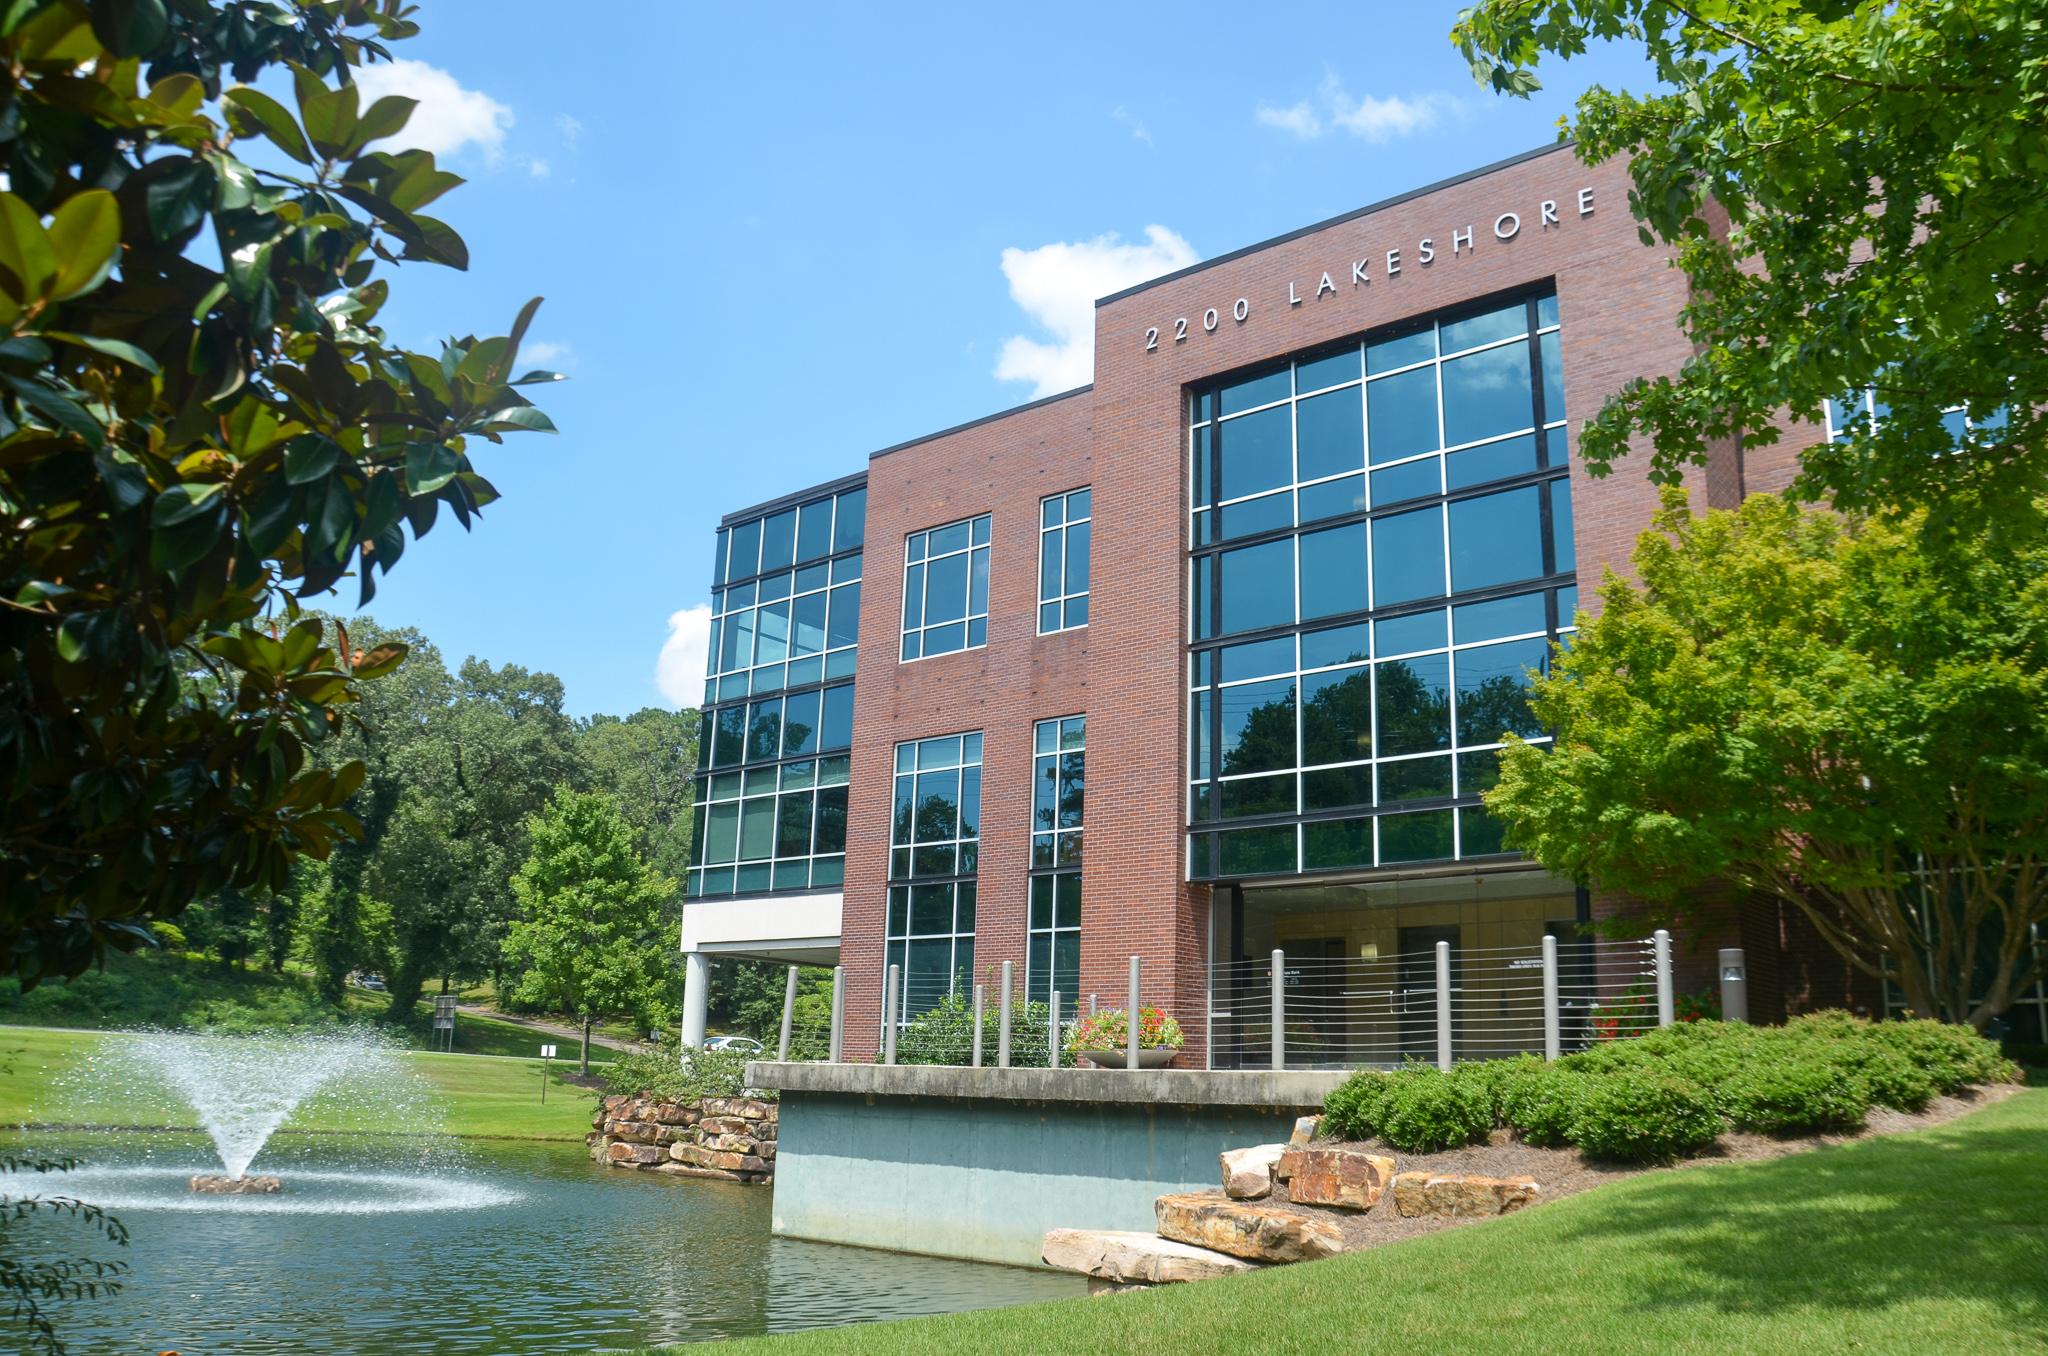 2200 Lakeshore Building